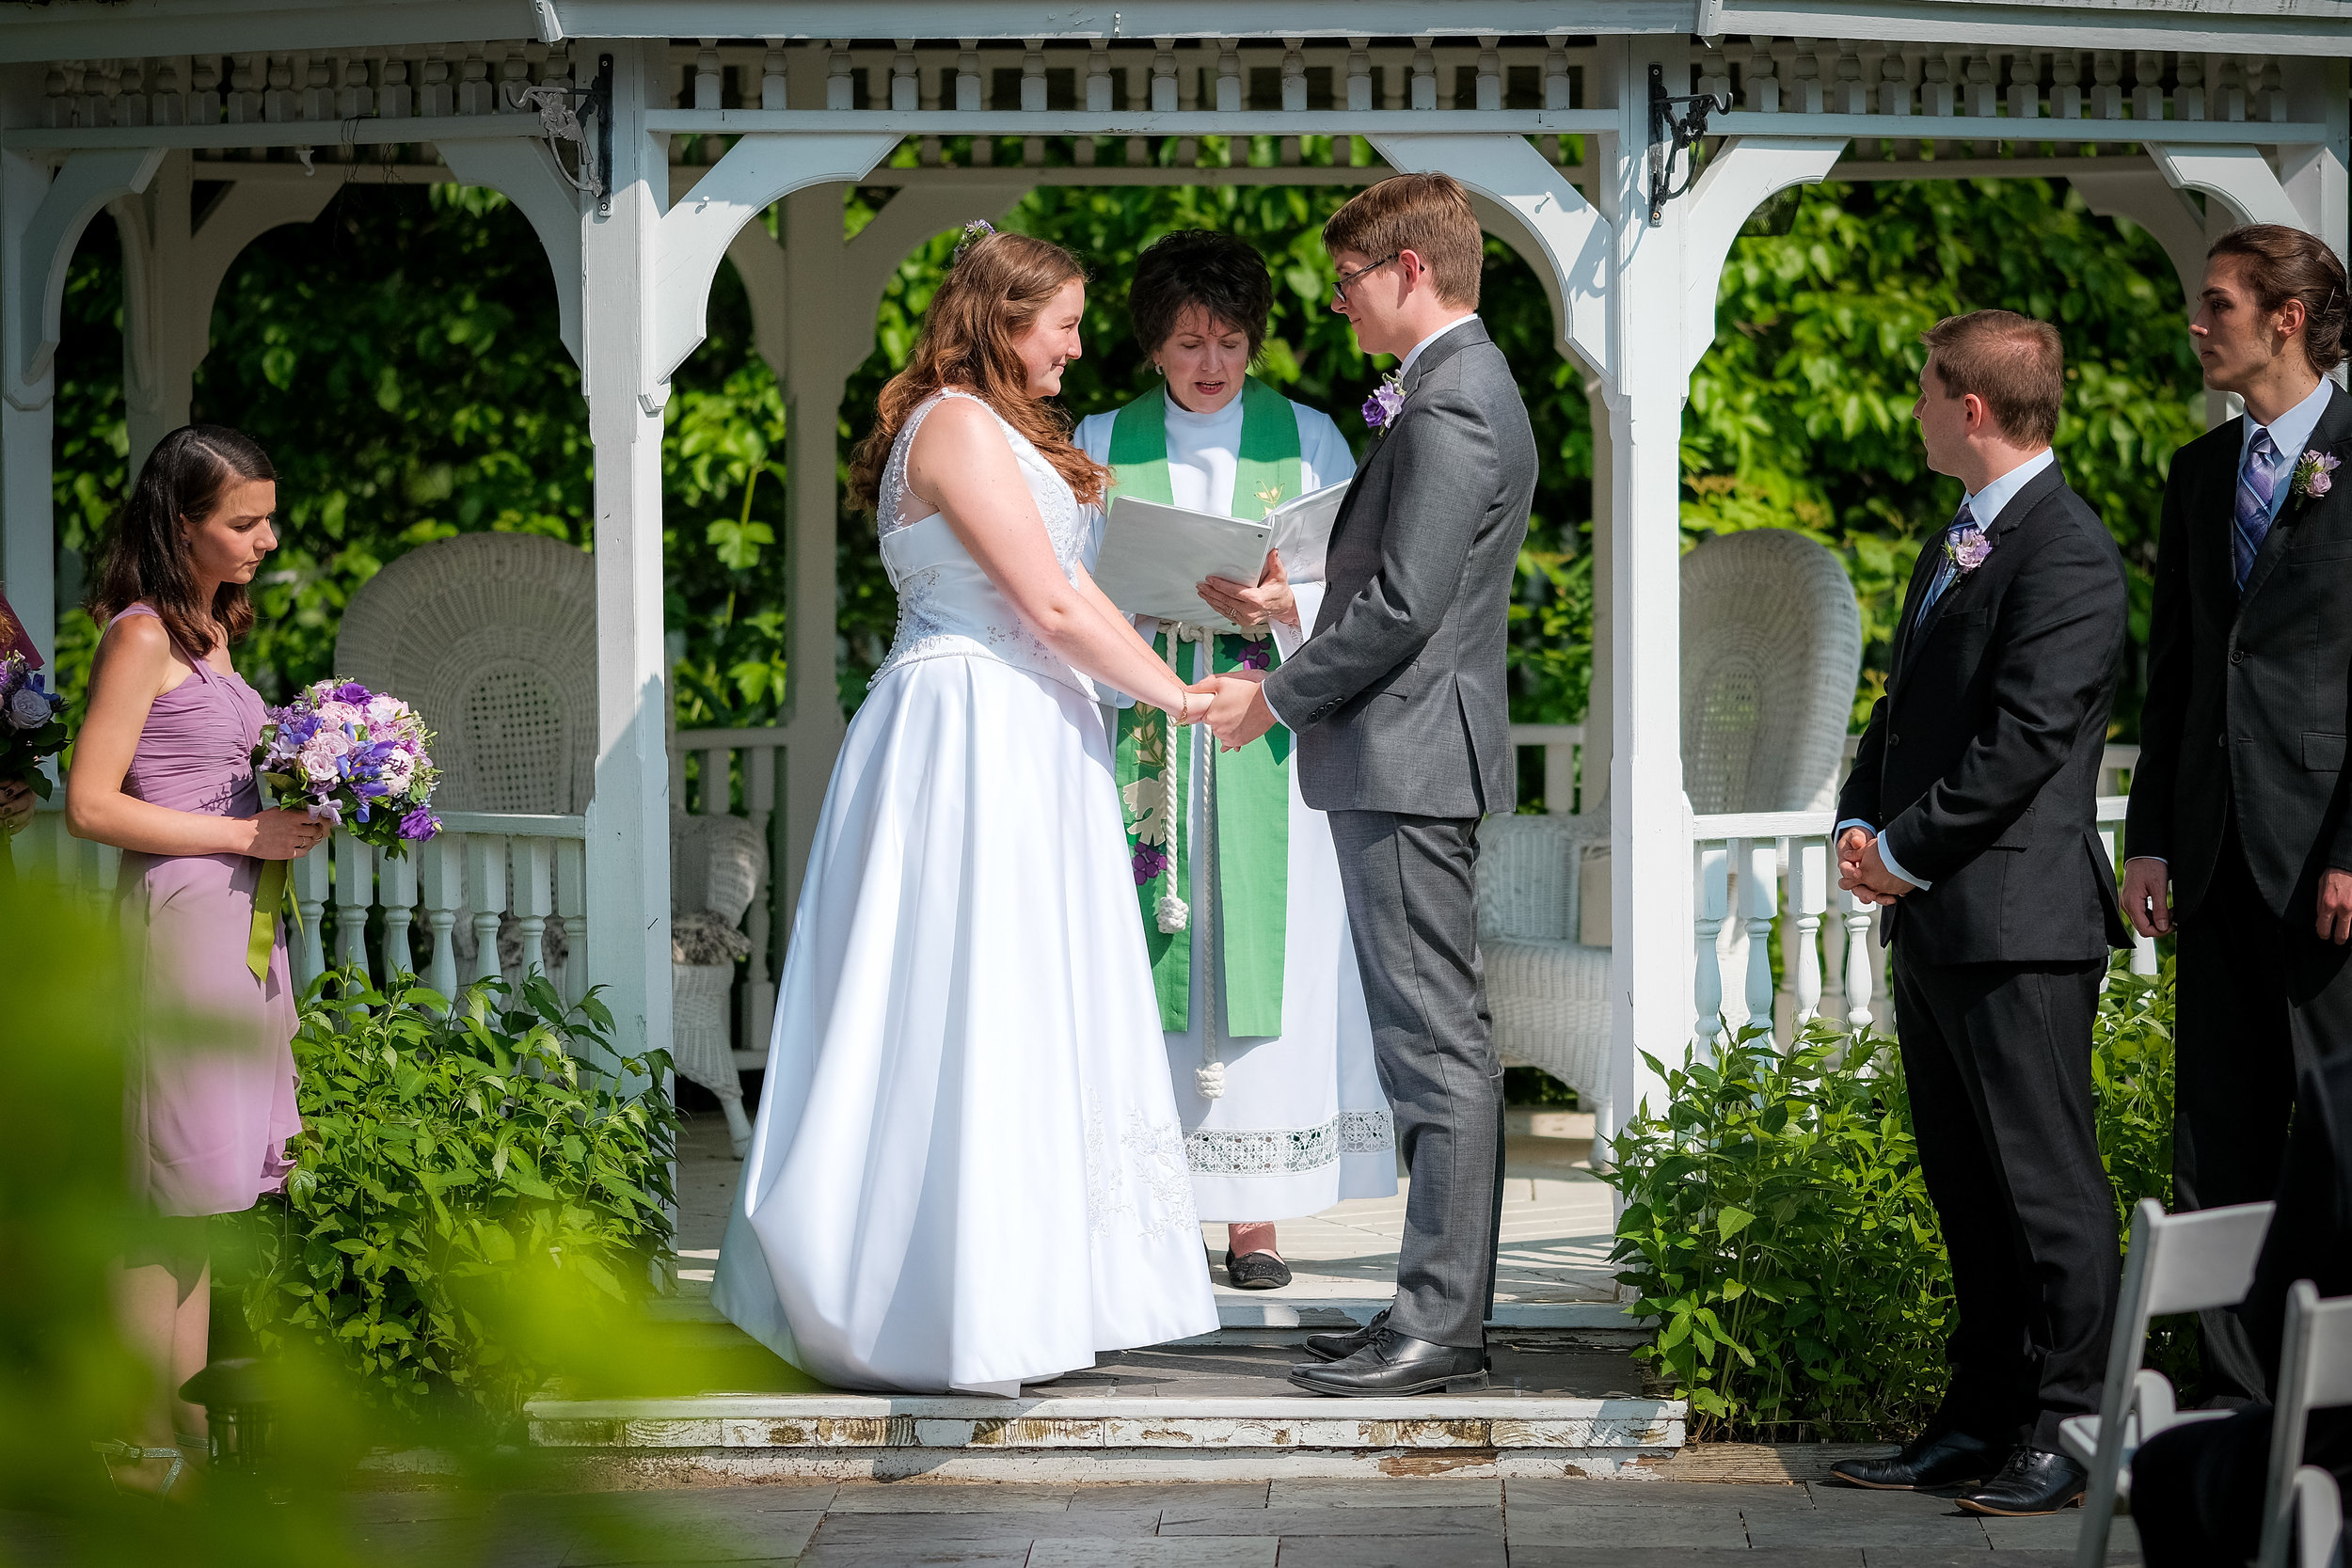 Vermont-Lilac-Inn-Wedding-Photography-639.jpg